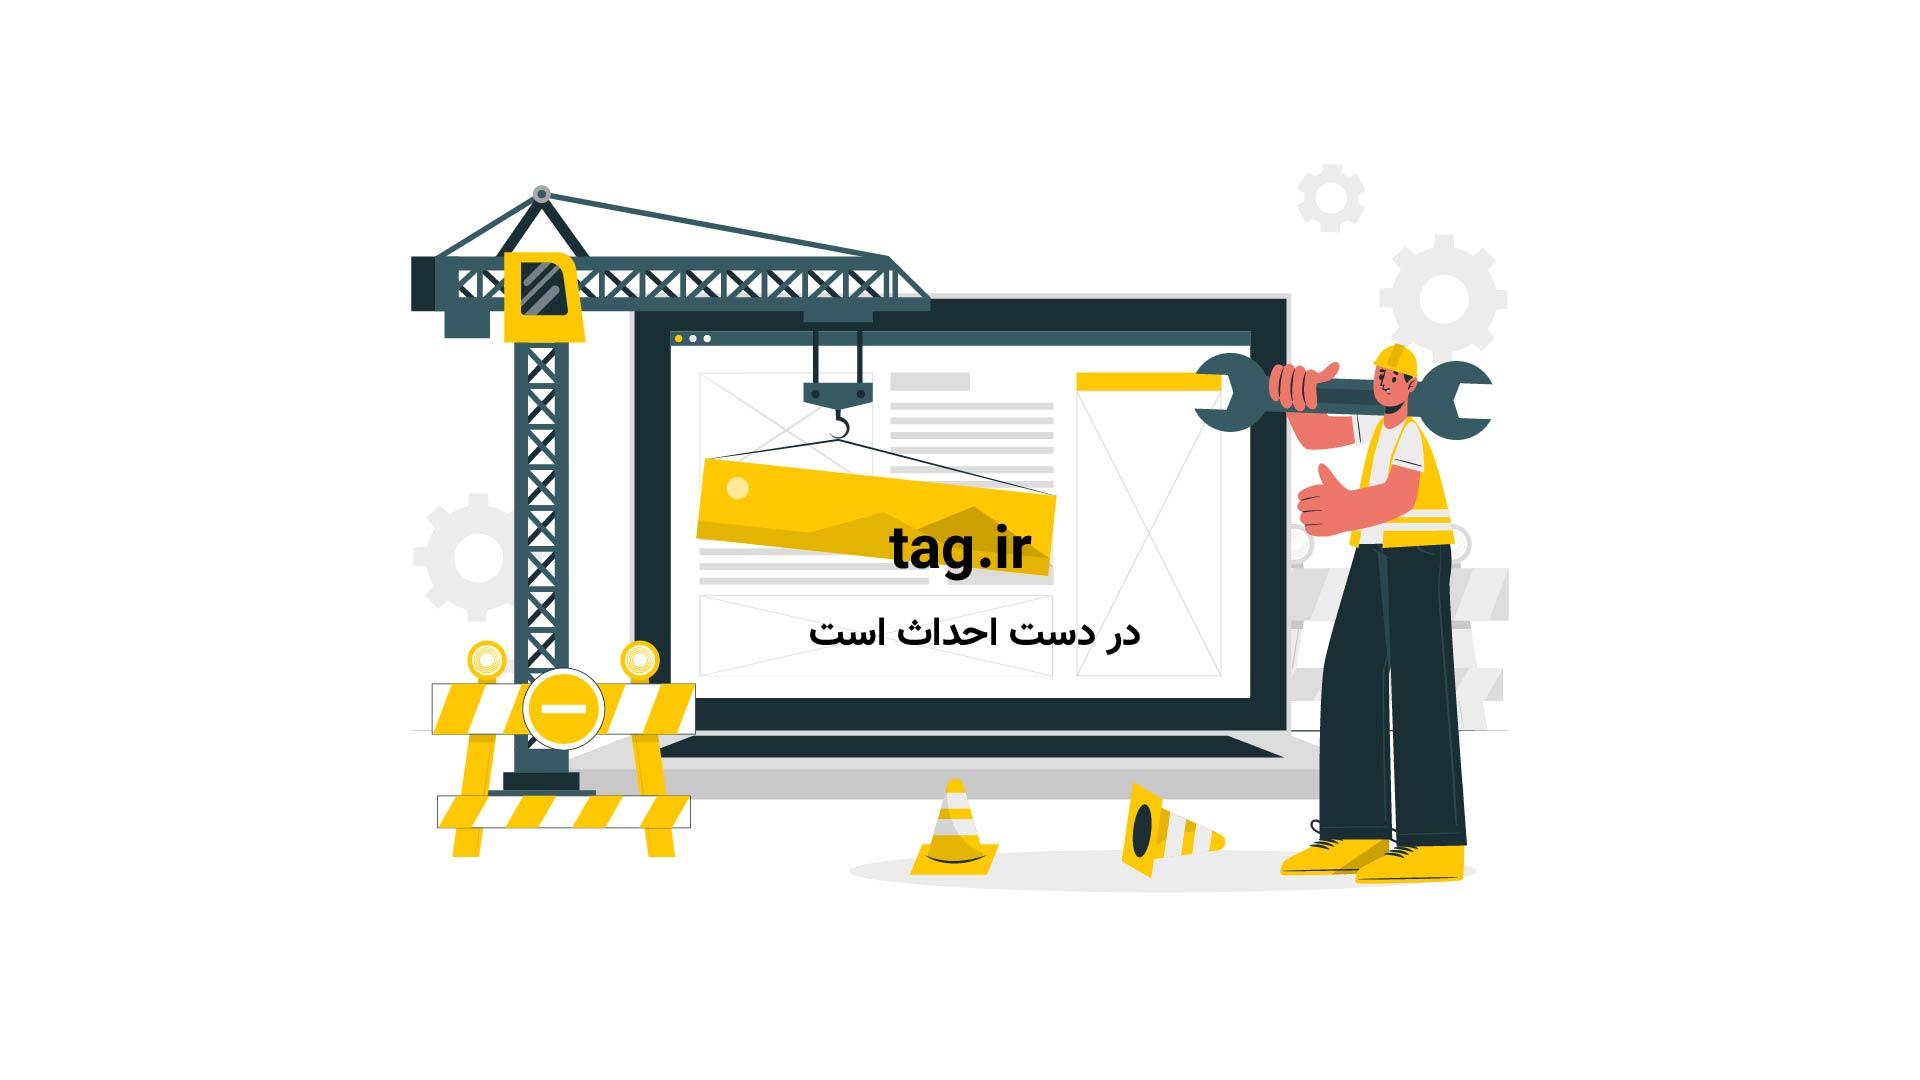 نتایج هفته شانزدهم لیگ برتر انگلیس | فیلم